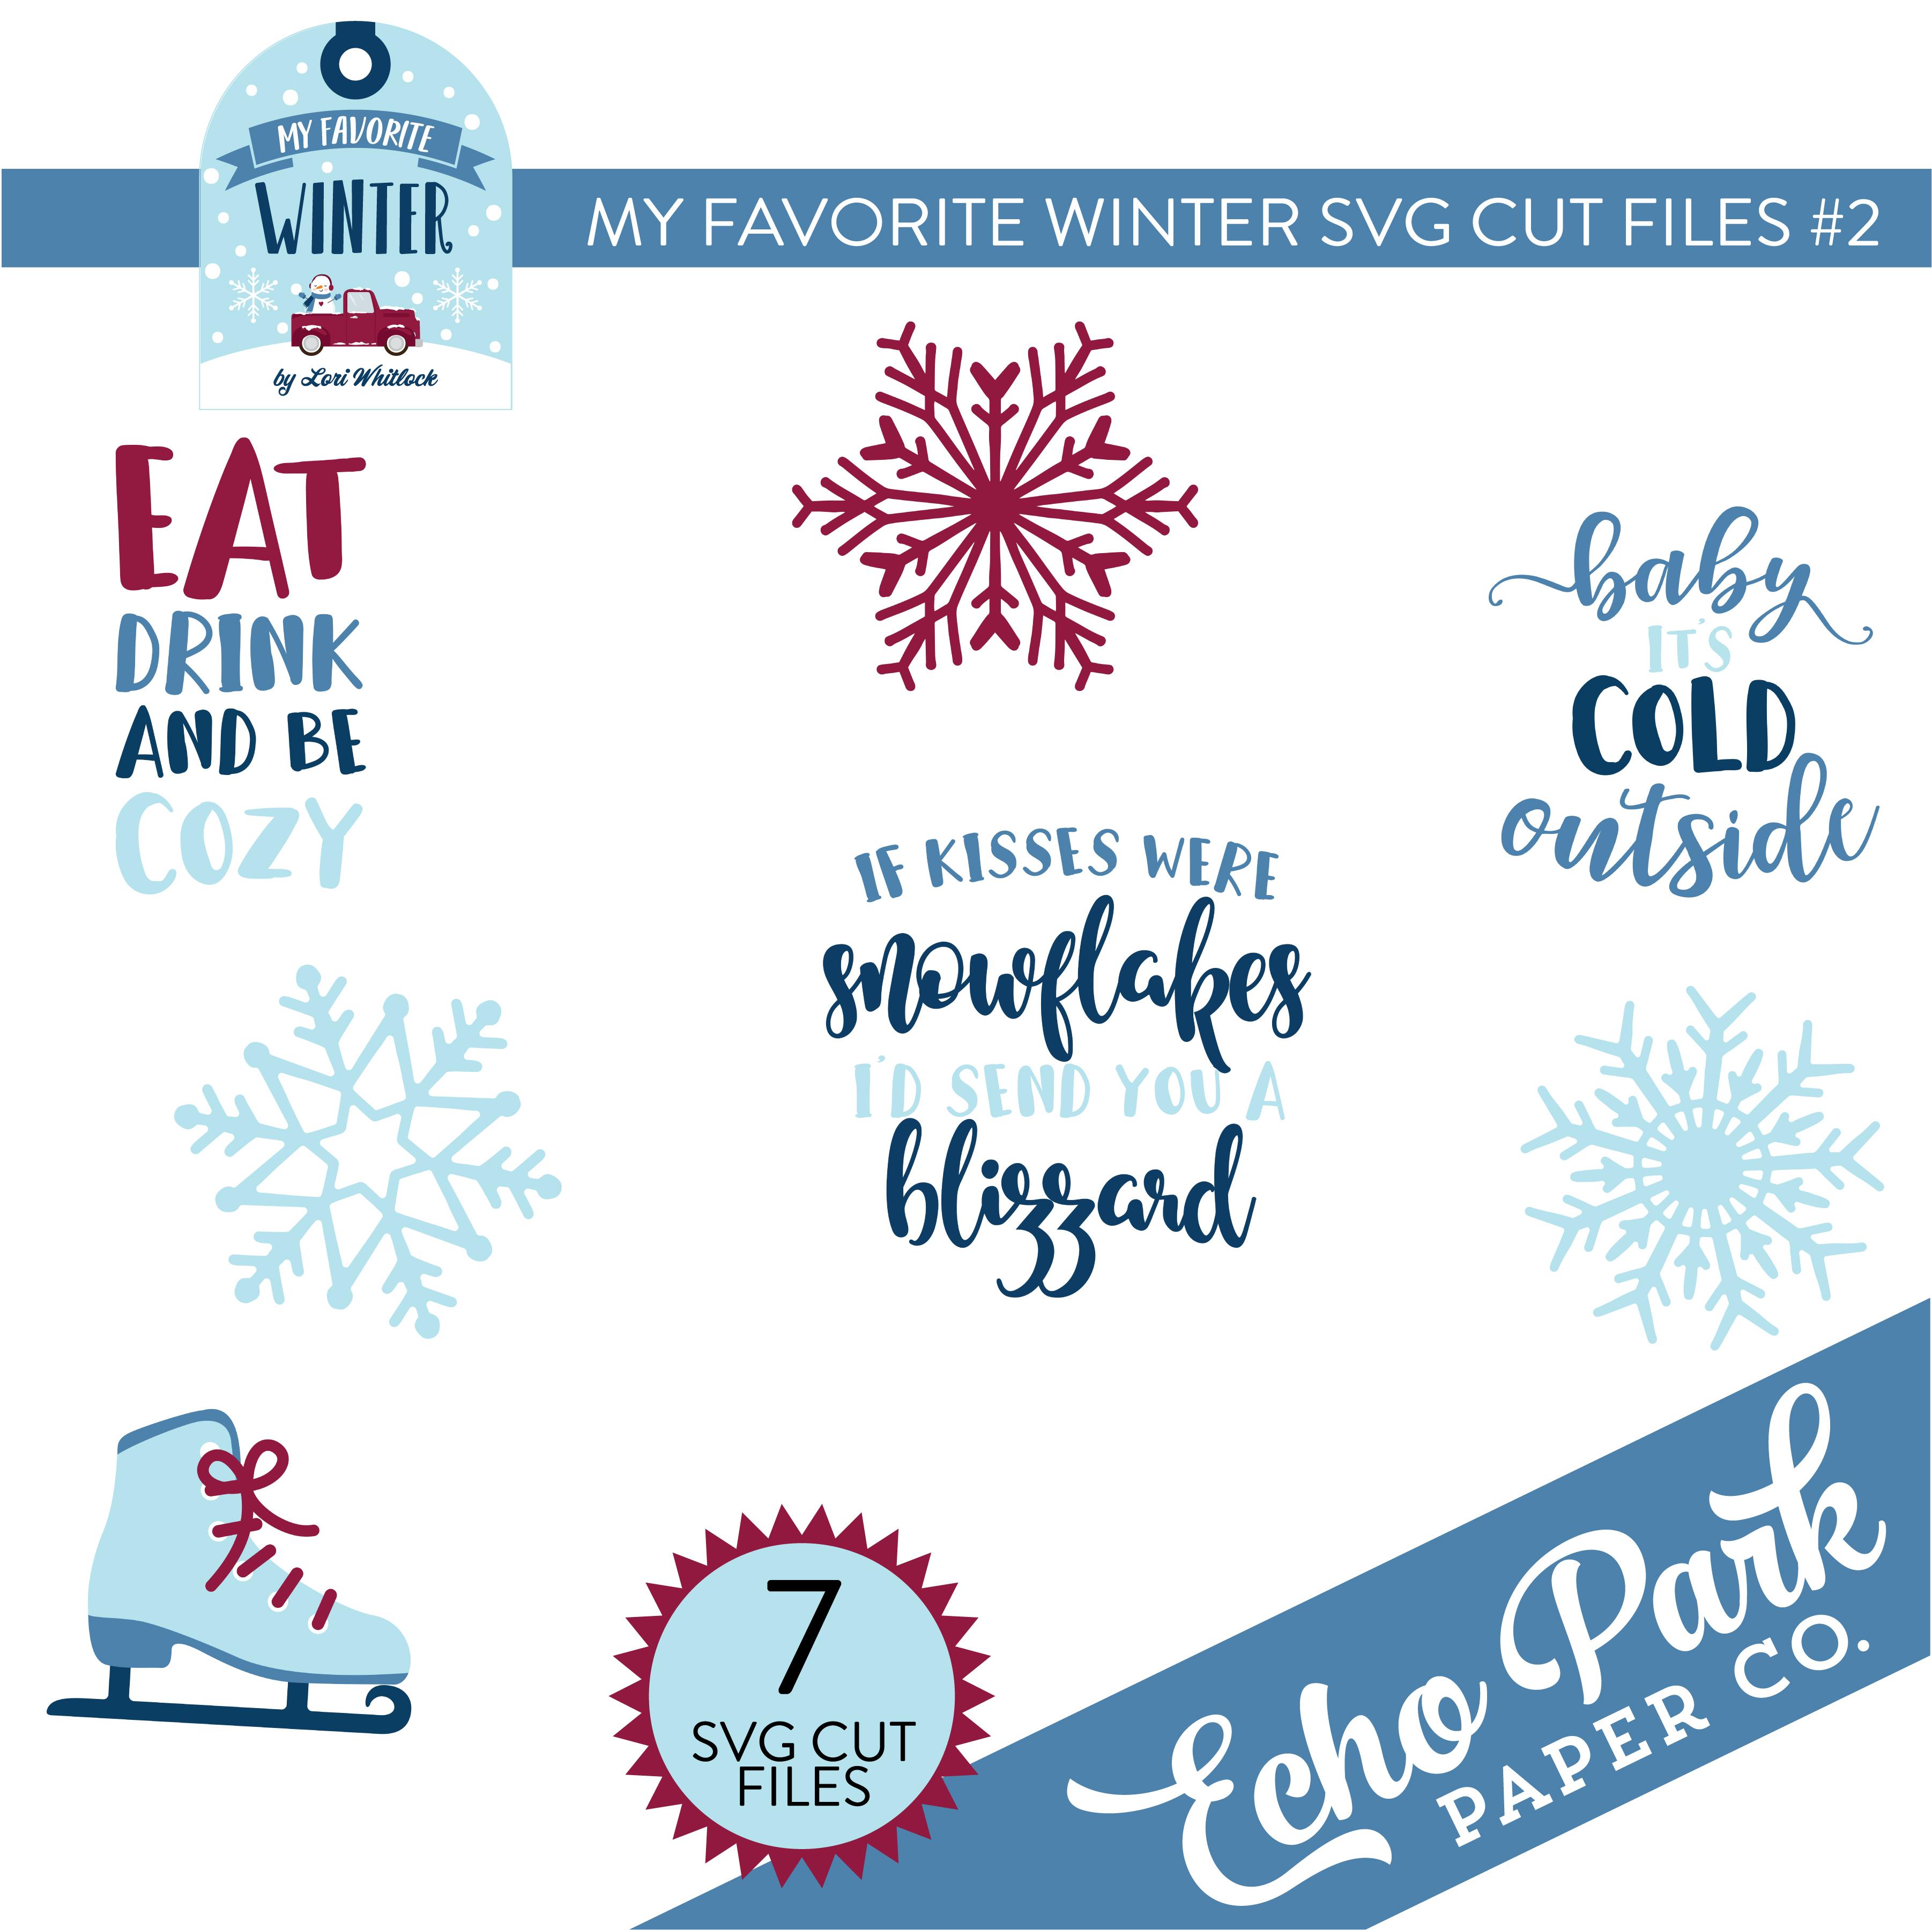 My Favorite Winter SVG Cut Files #2